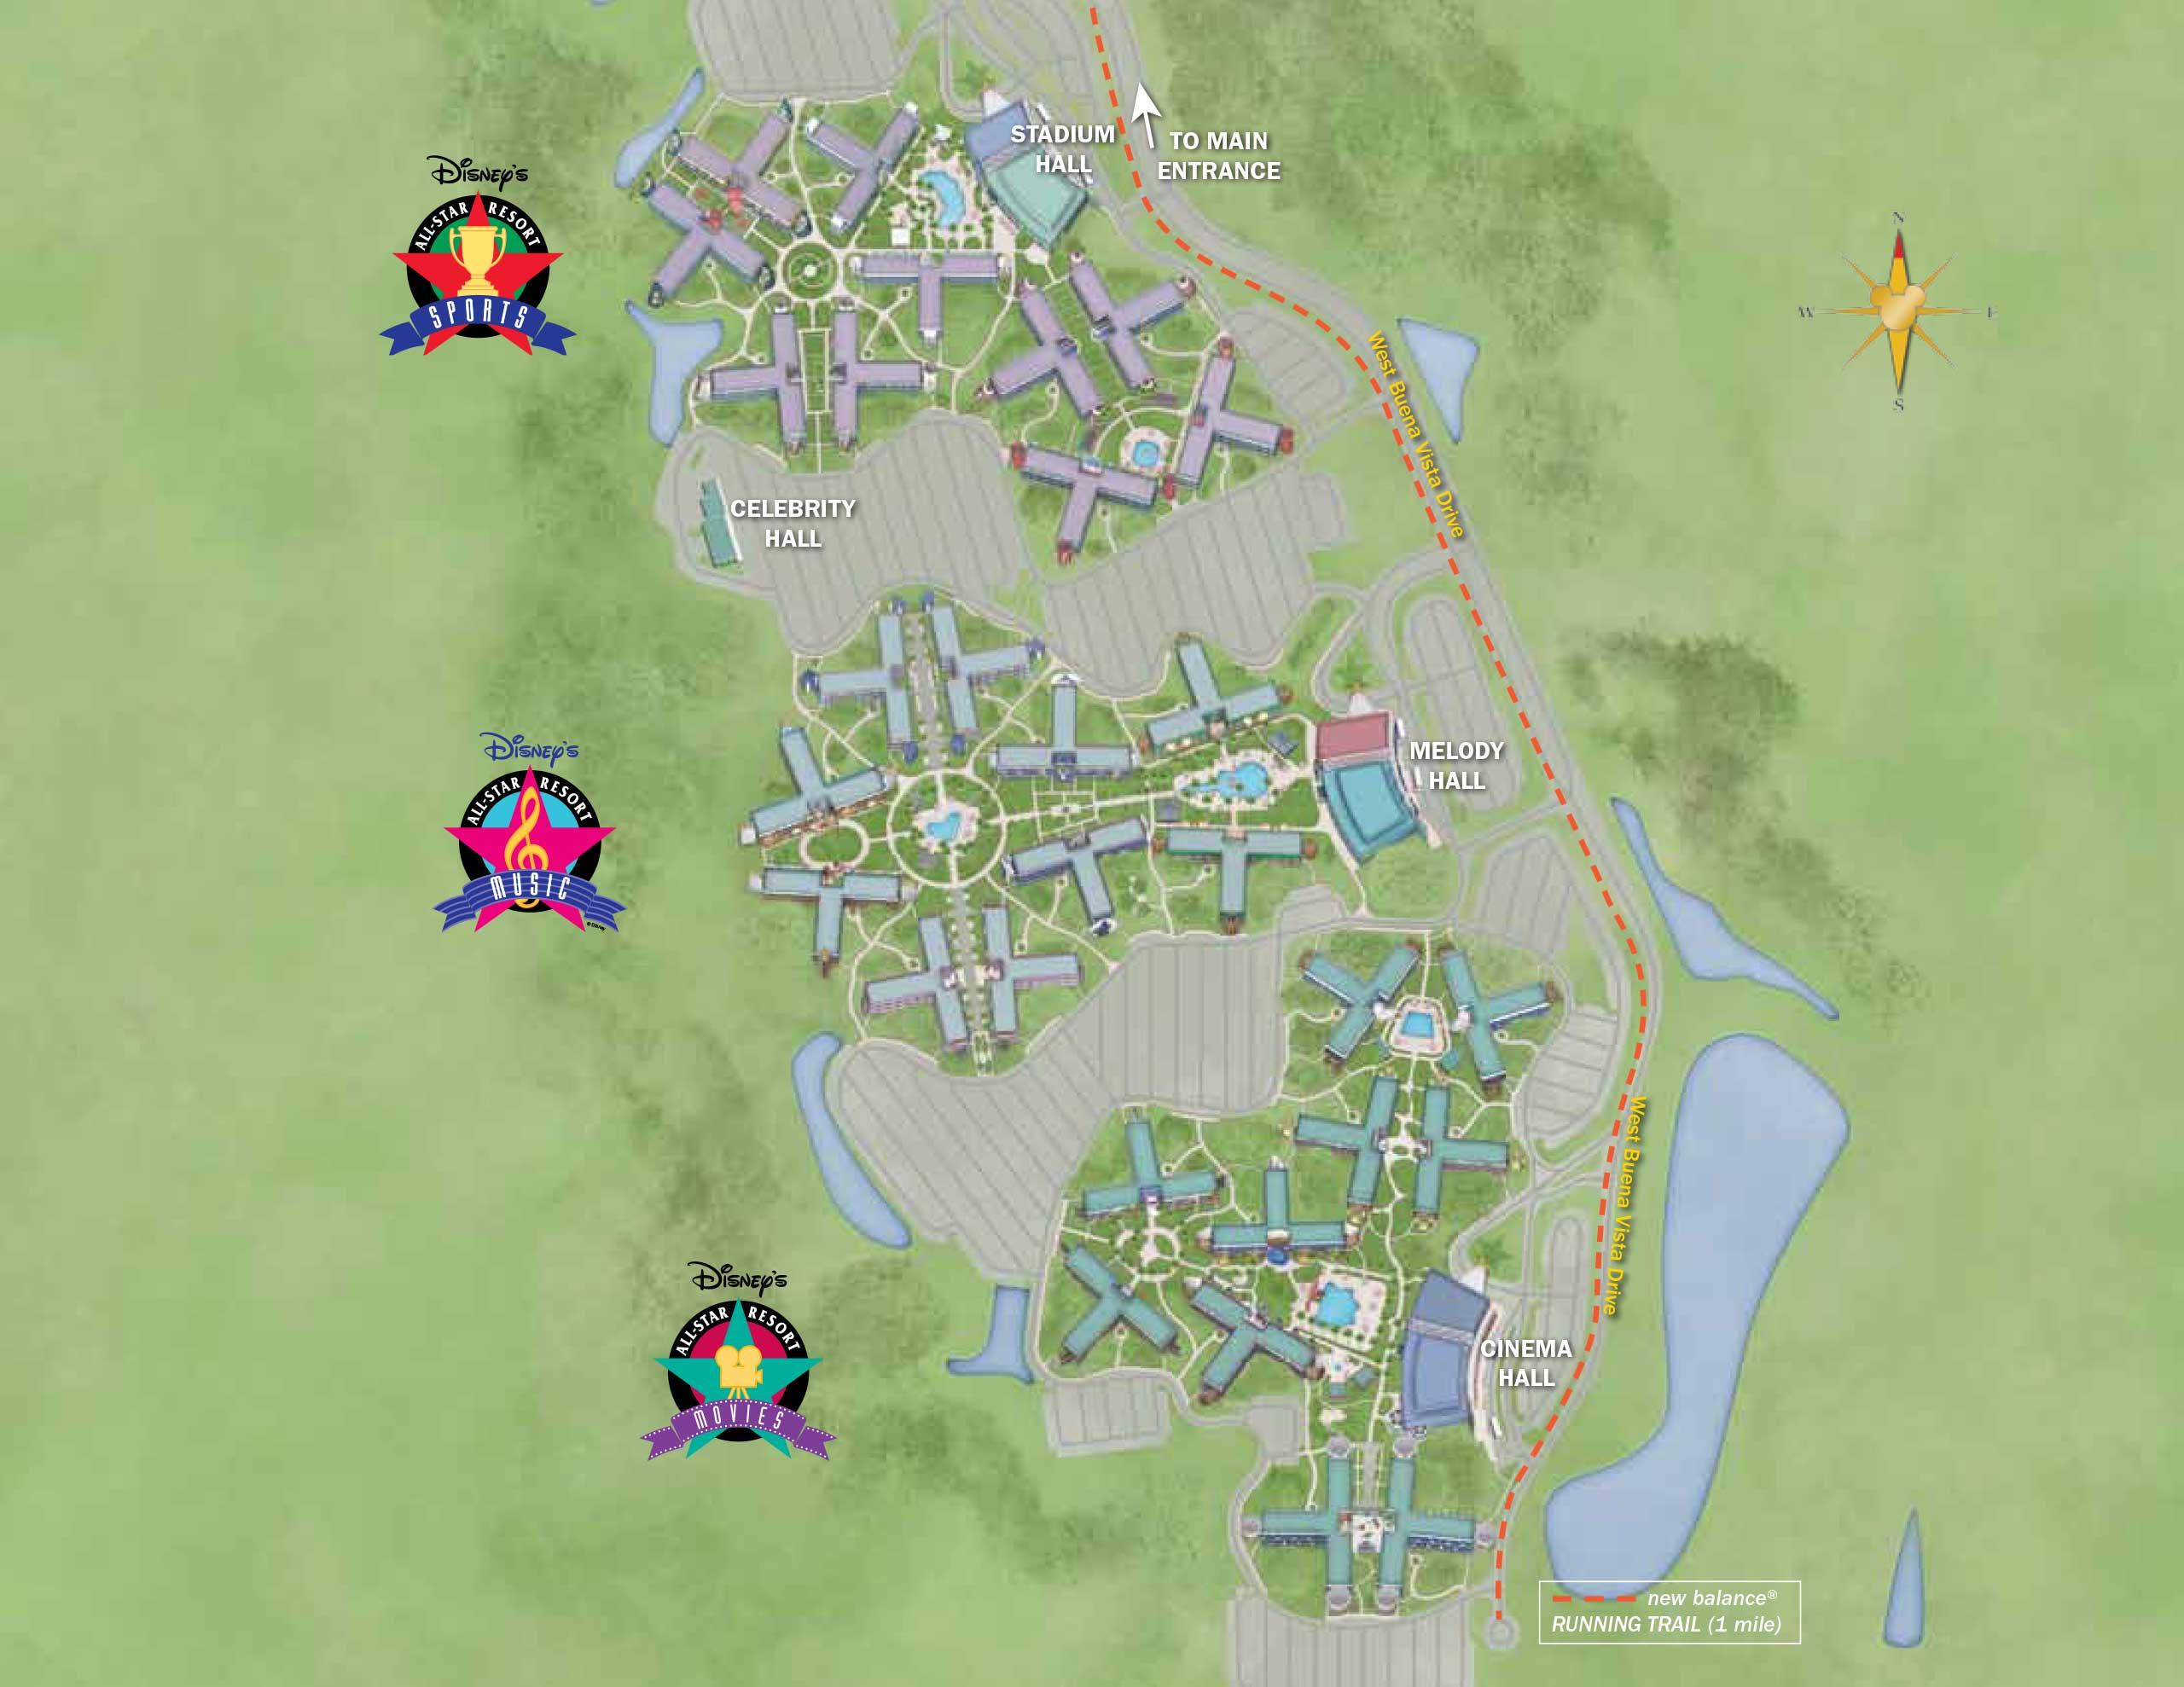 Walt Disney World Map With Hotels.April 2017 Walt Disney World Resort Hotel Maps Photo 1 Of 33